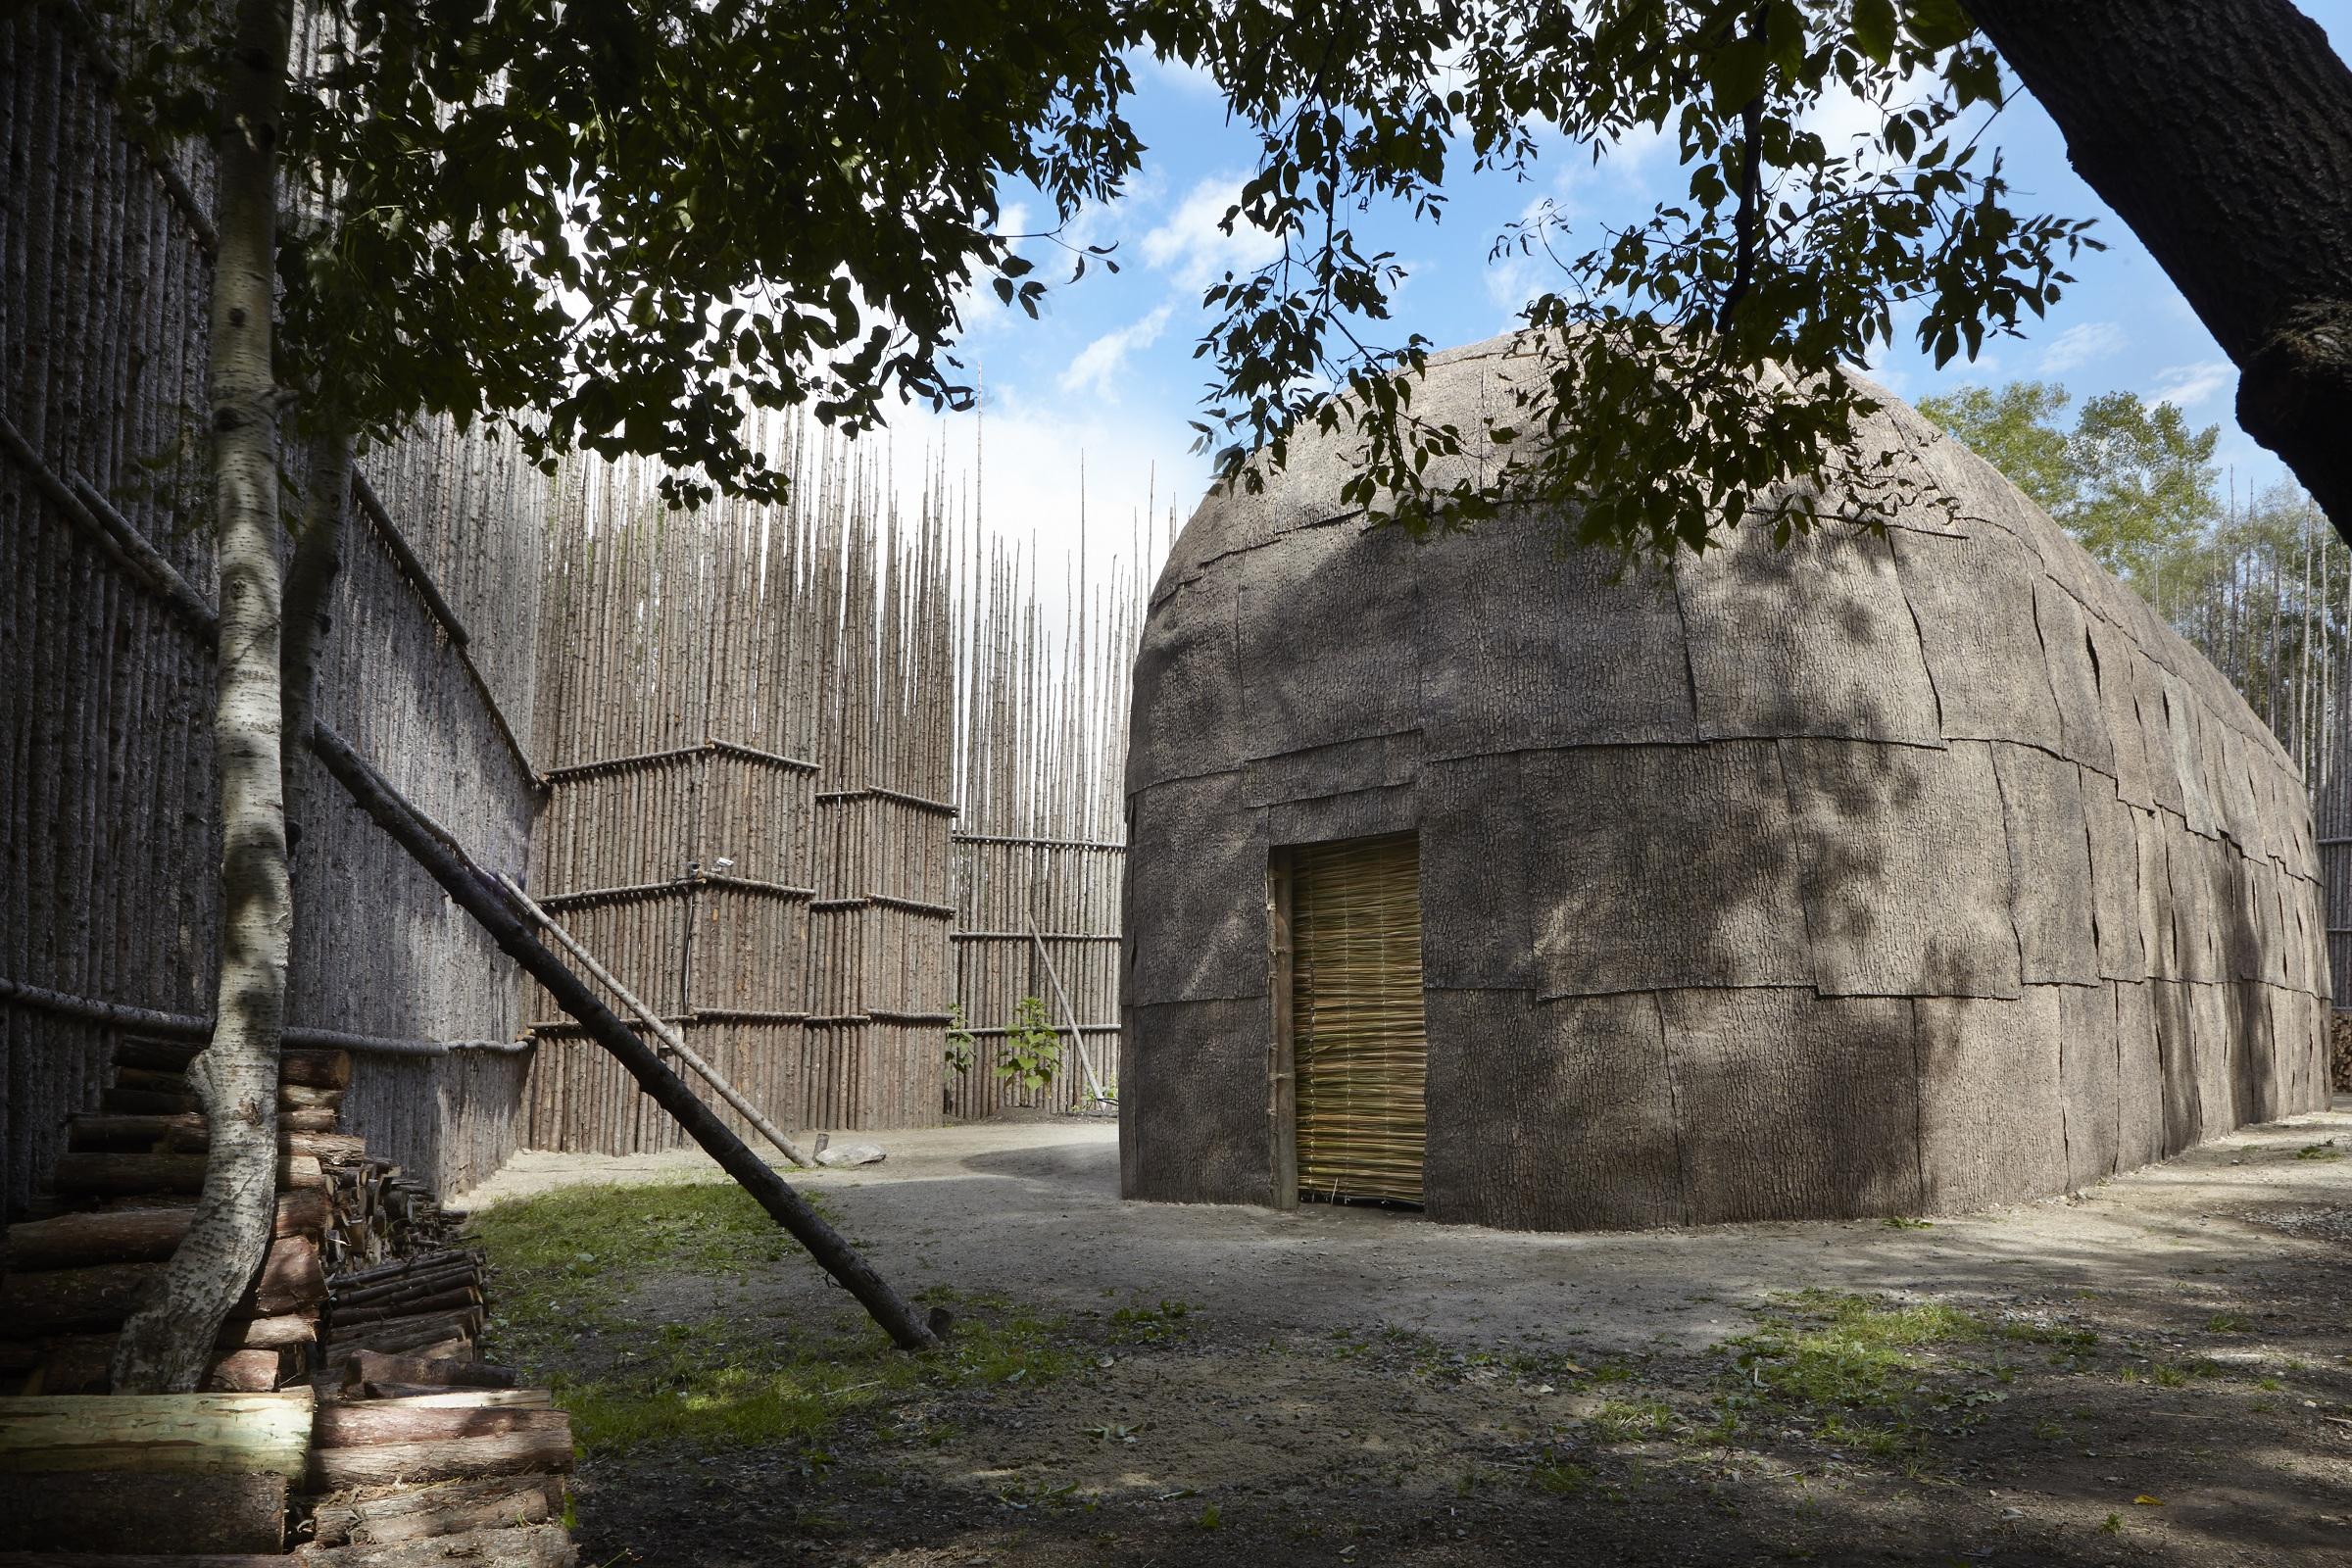 Visit to the Ekionkiestha' national longhouse